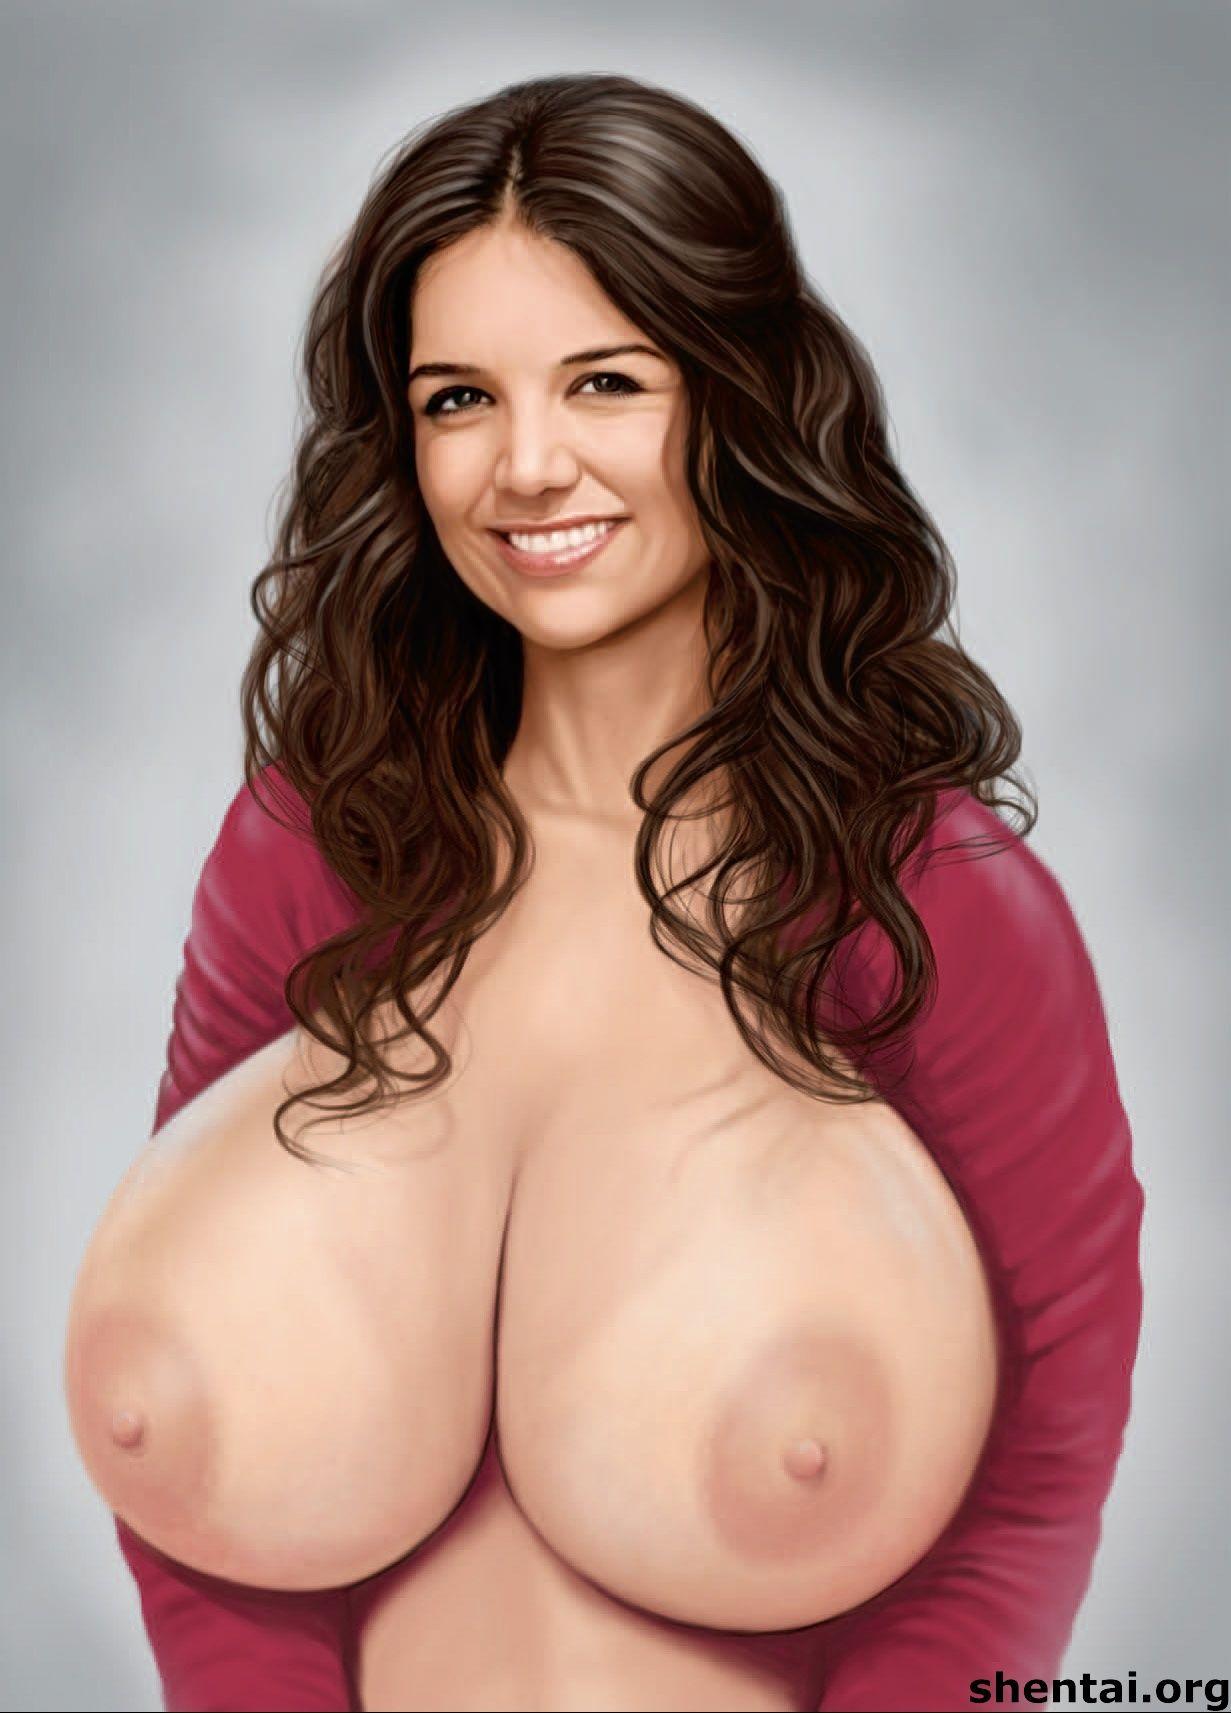 Big Boobs Celeb Kim Kardashian Big Boobs Celebrities